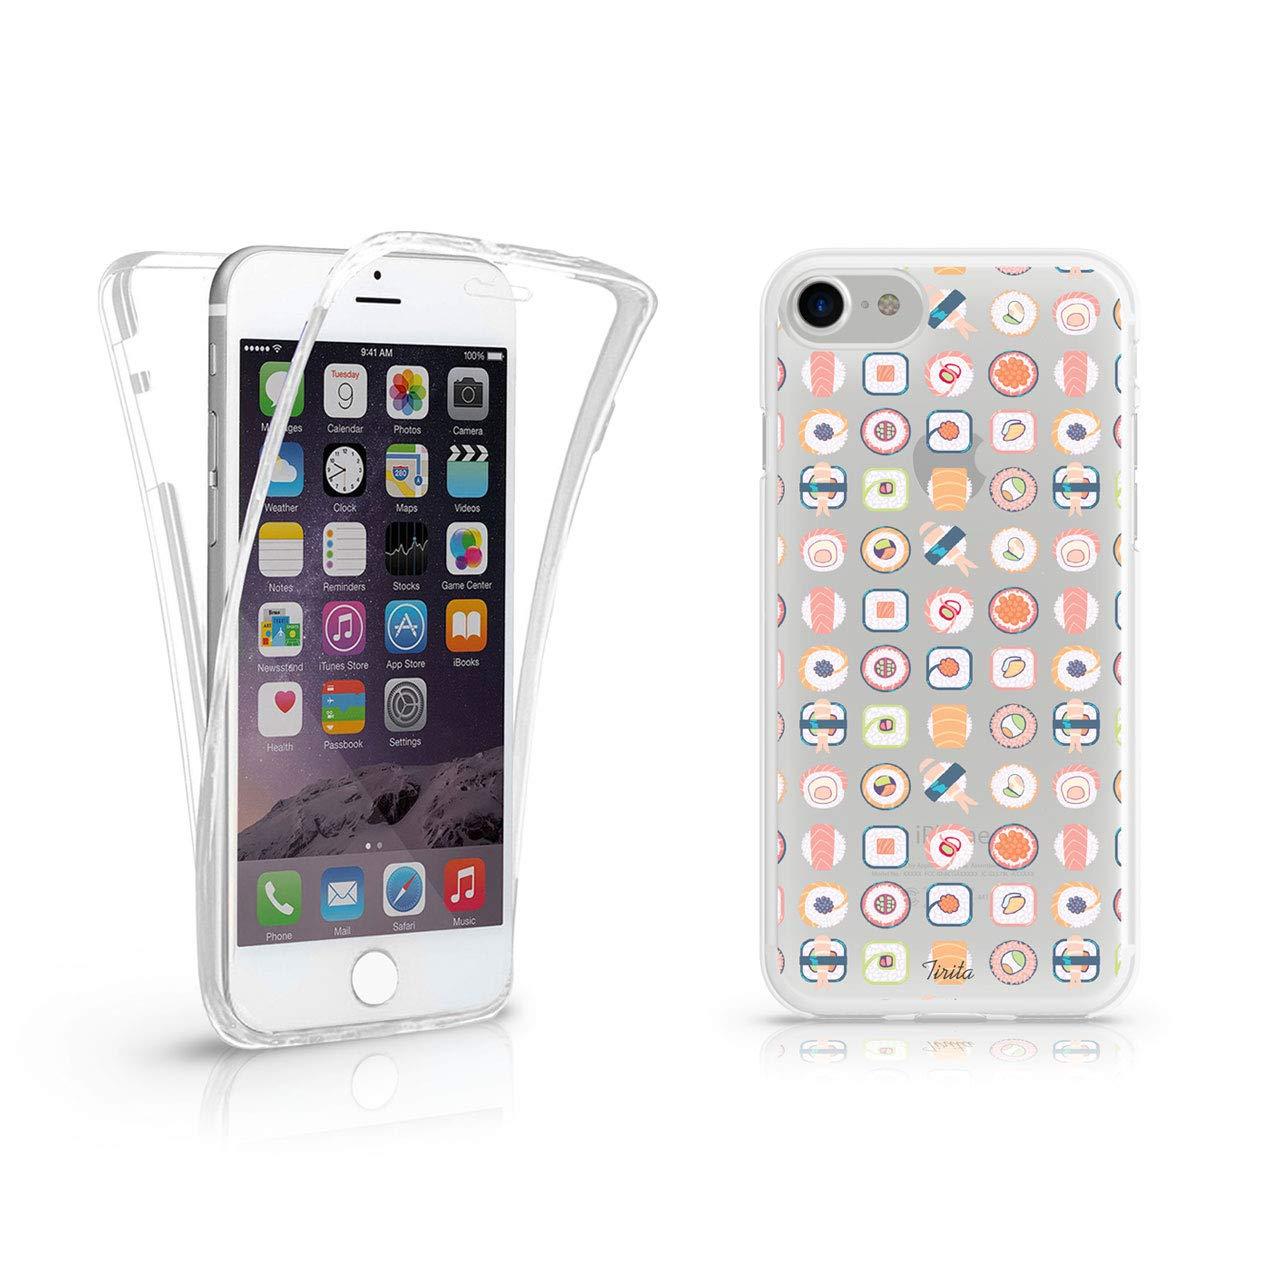 iPhone X Tiritaフル360保護クリアソフトジェル電話ケース寿司和食日本流行ファッションギフトプレゼント   B07GLFXDKQ